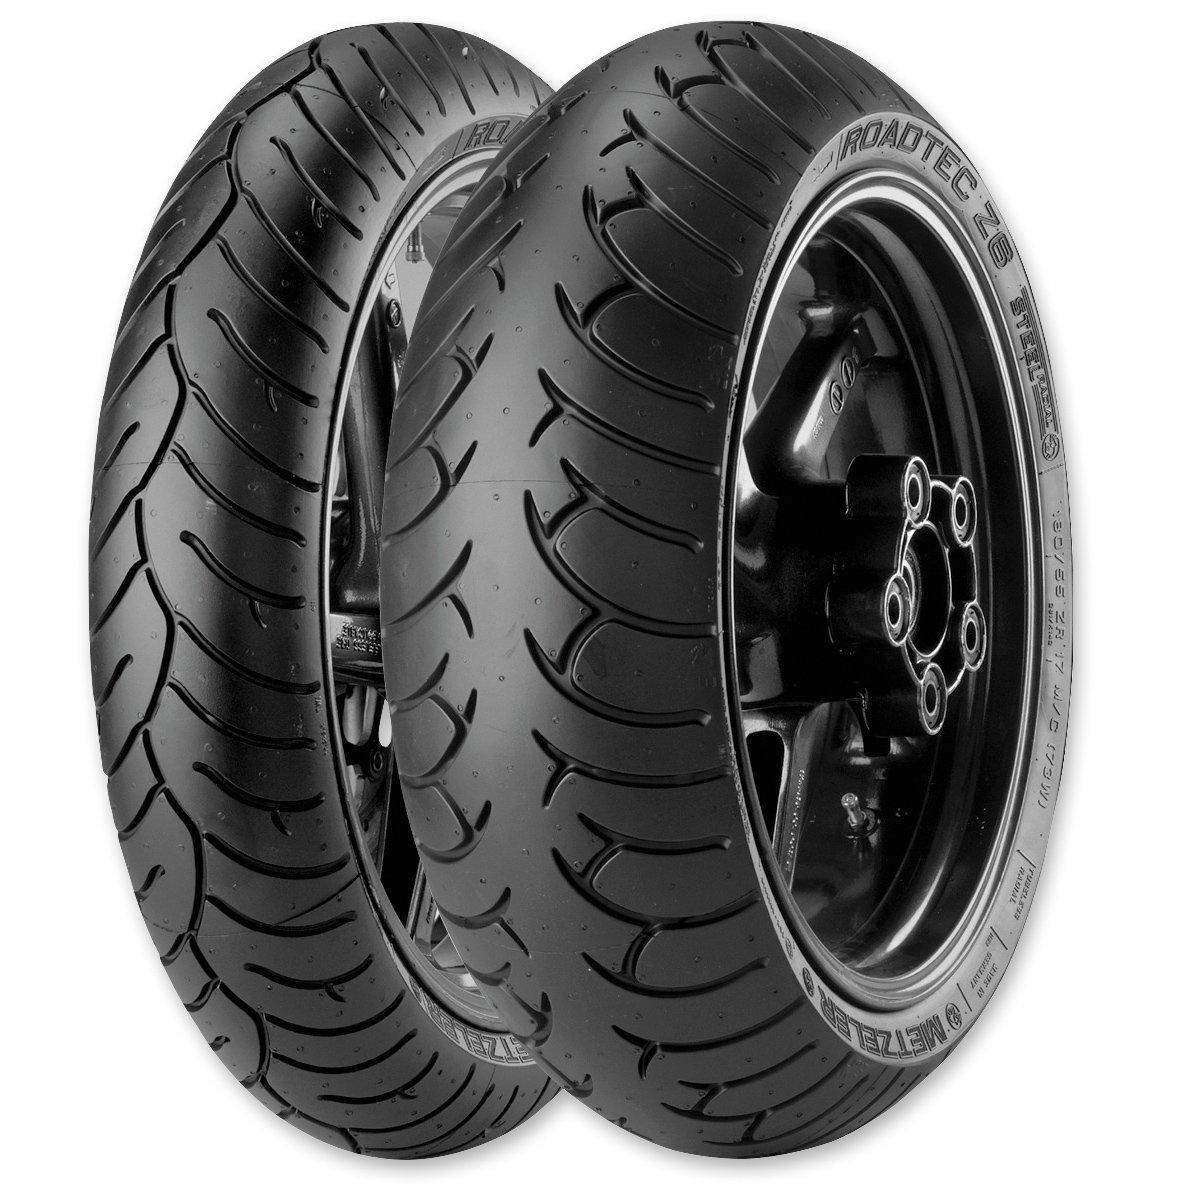 Metzeler Roadtec Z6 Front Tire (120/70ZR17) 1448100